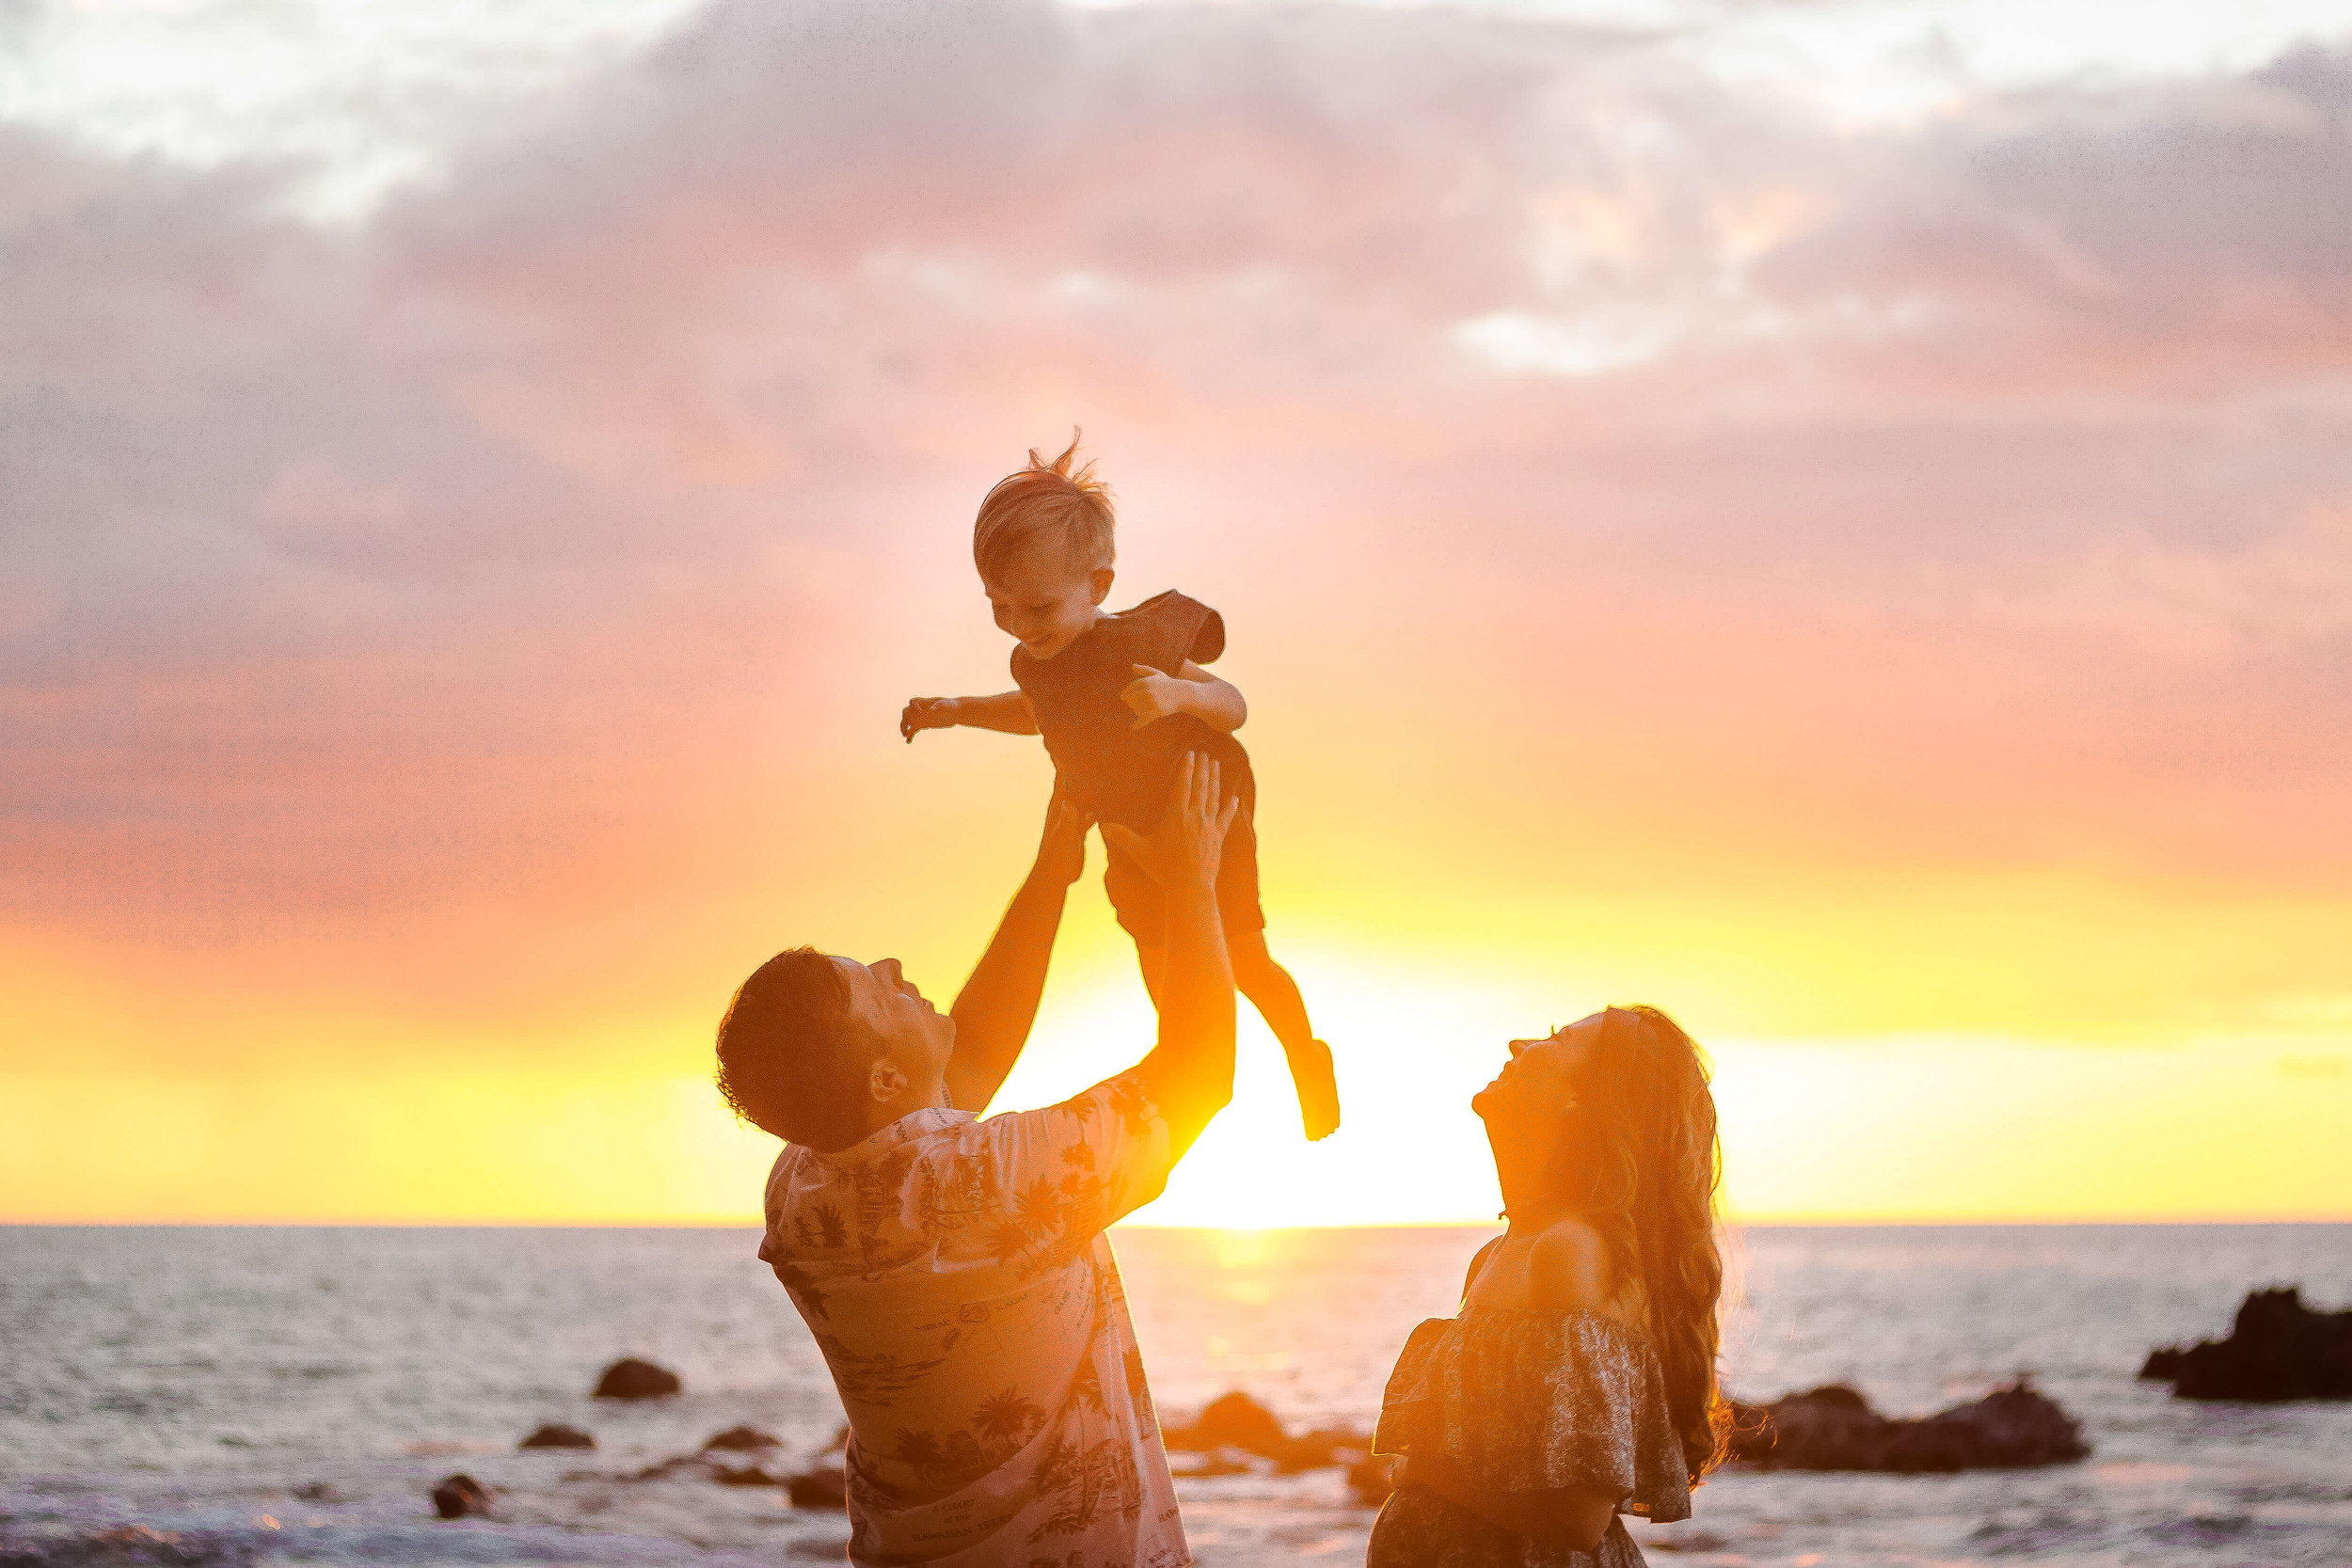 sunset family beach with toddler in kona hawaii big island photographer.jpg